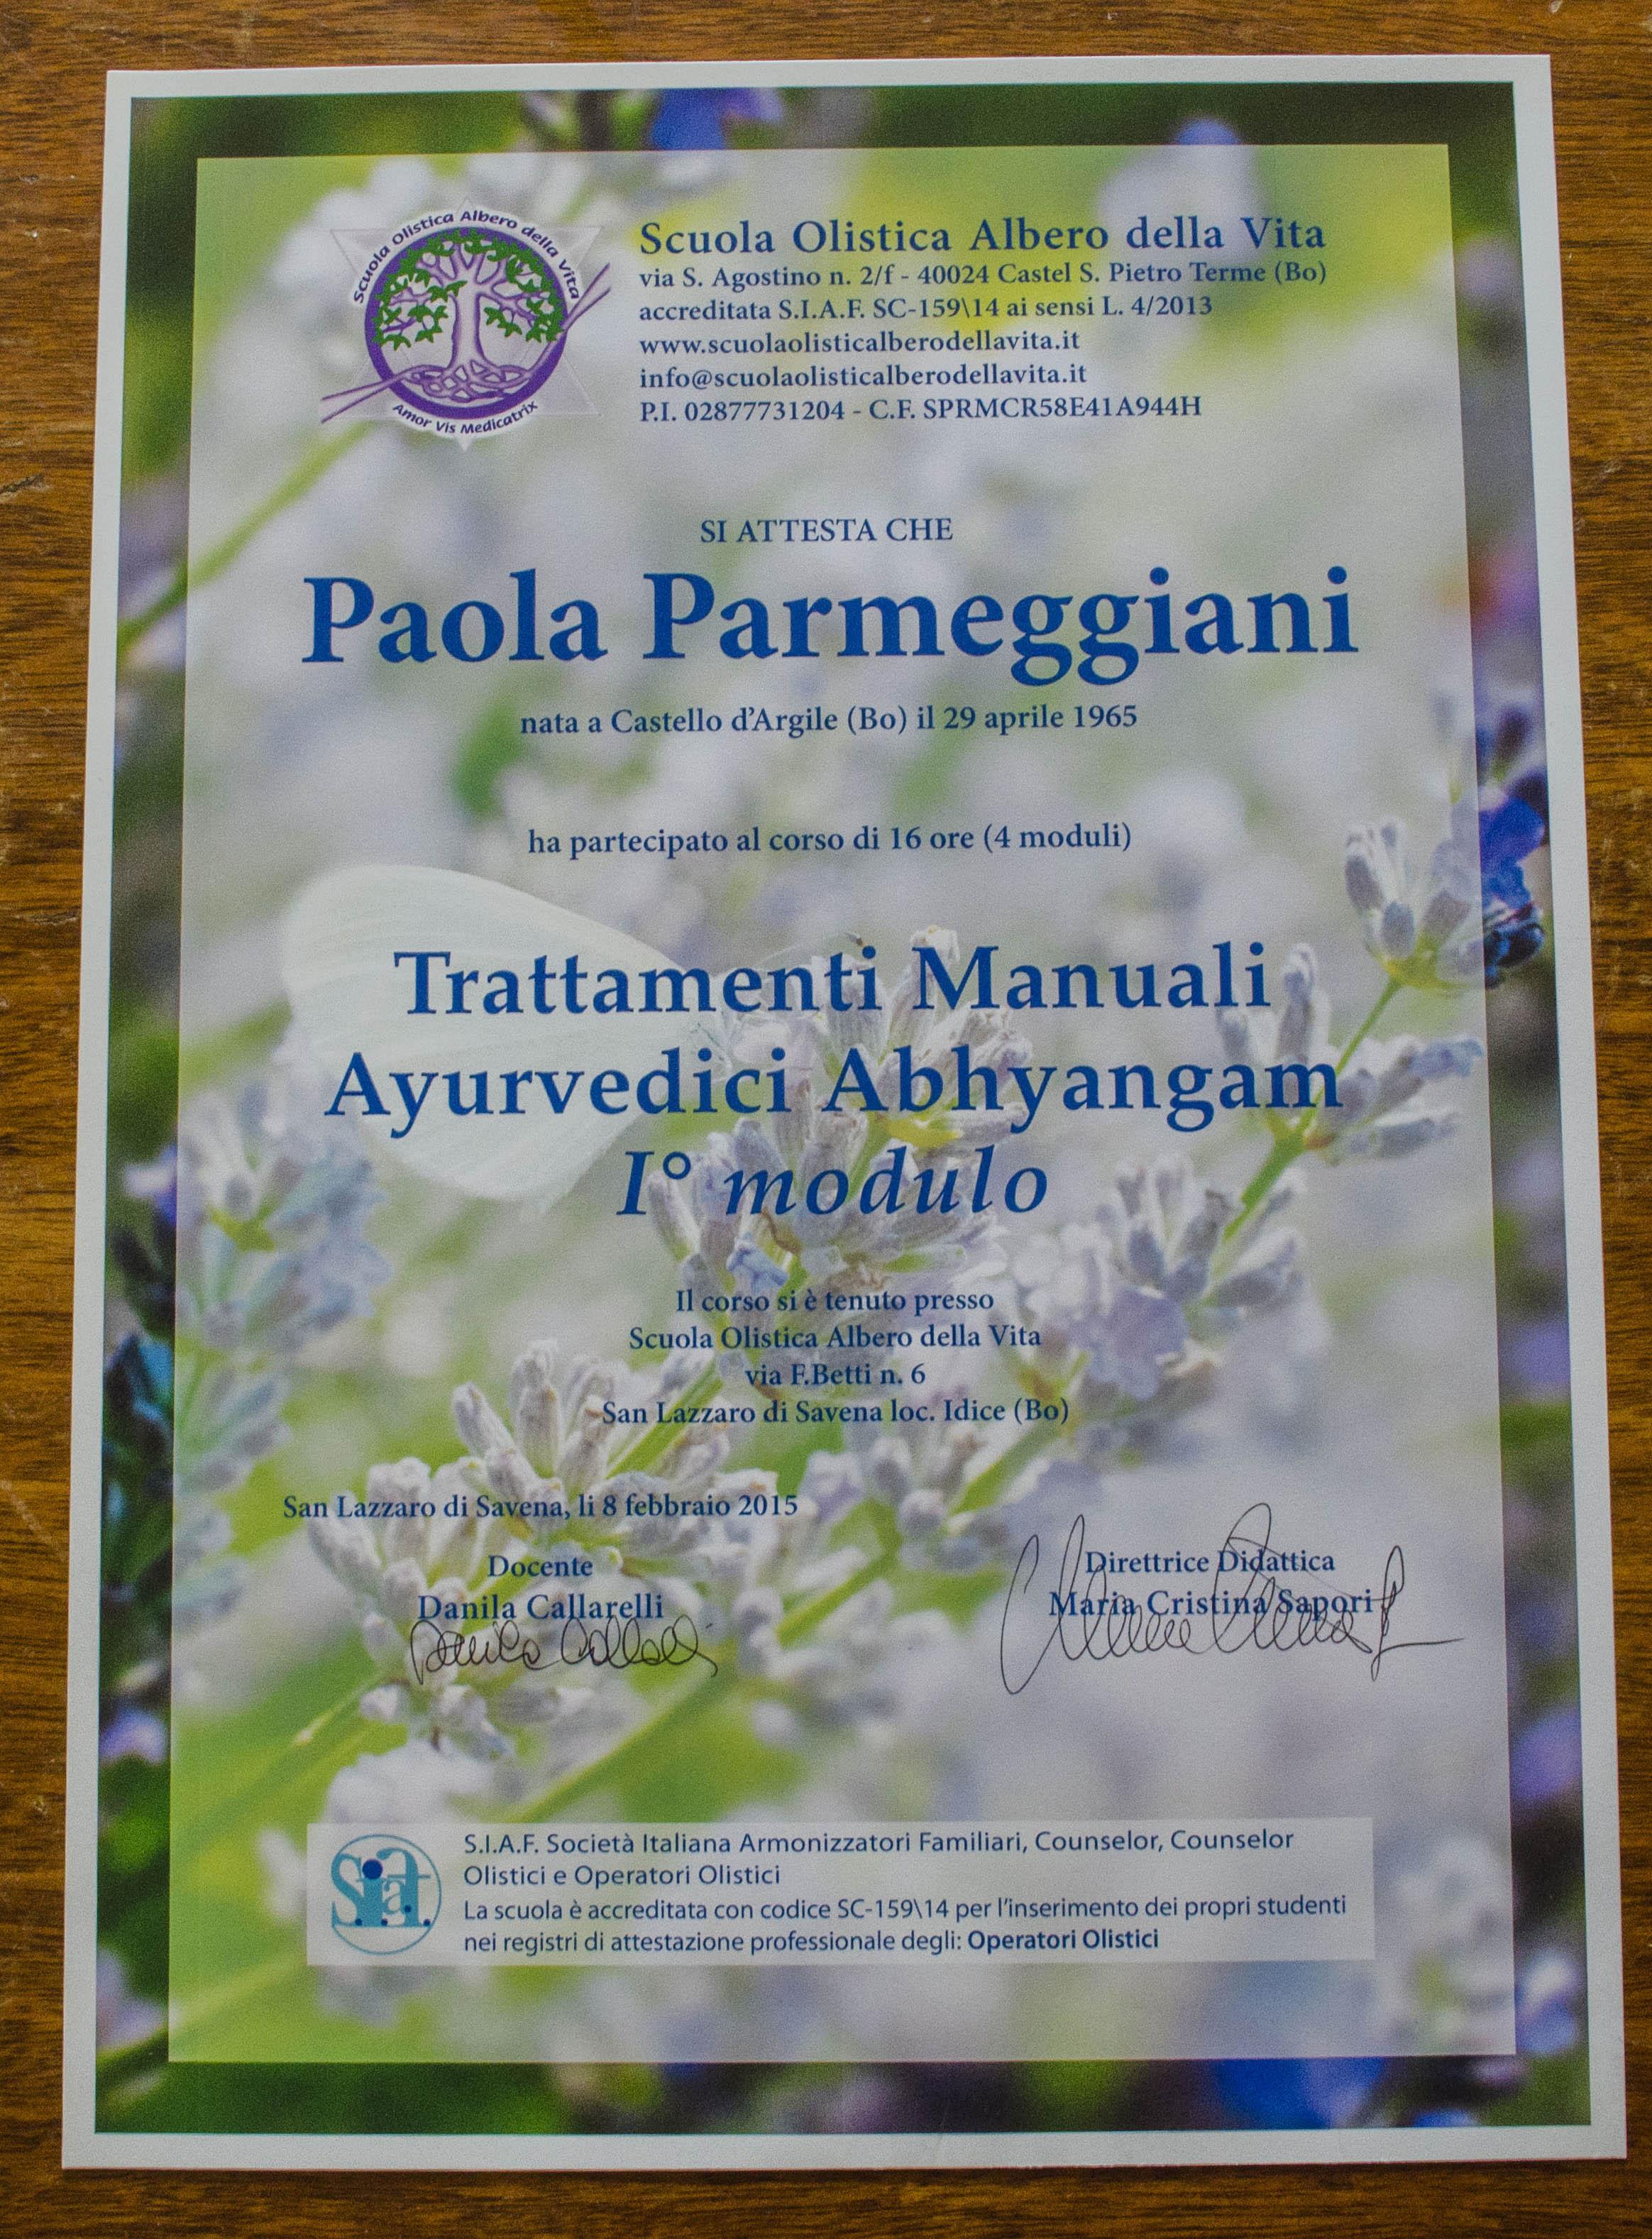 Trattamenti manuali Ayurvedici Abyangan